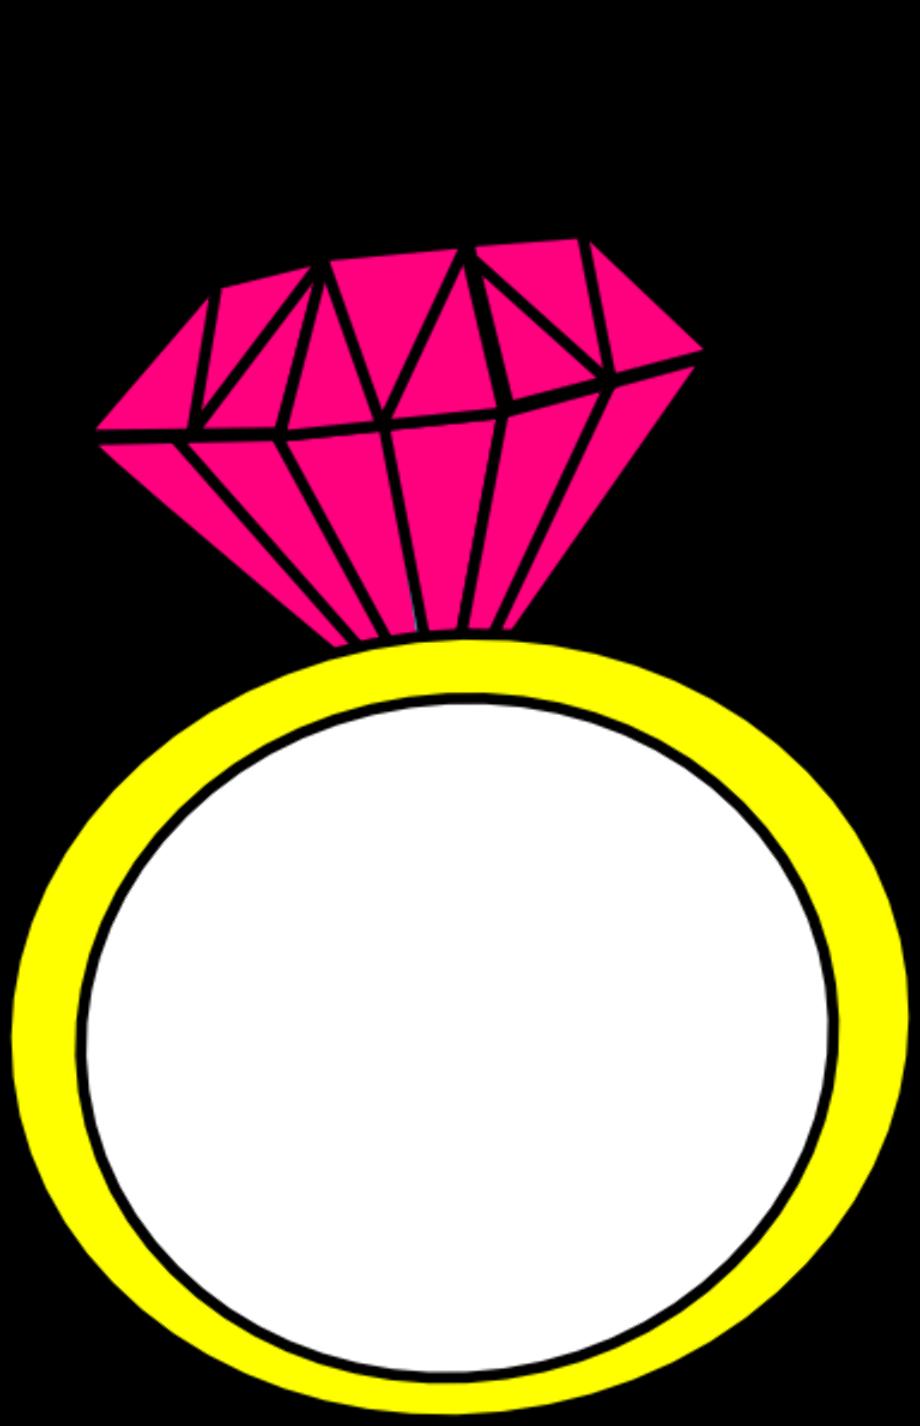 Wedding rings clipart diamond free